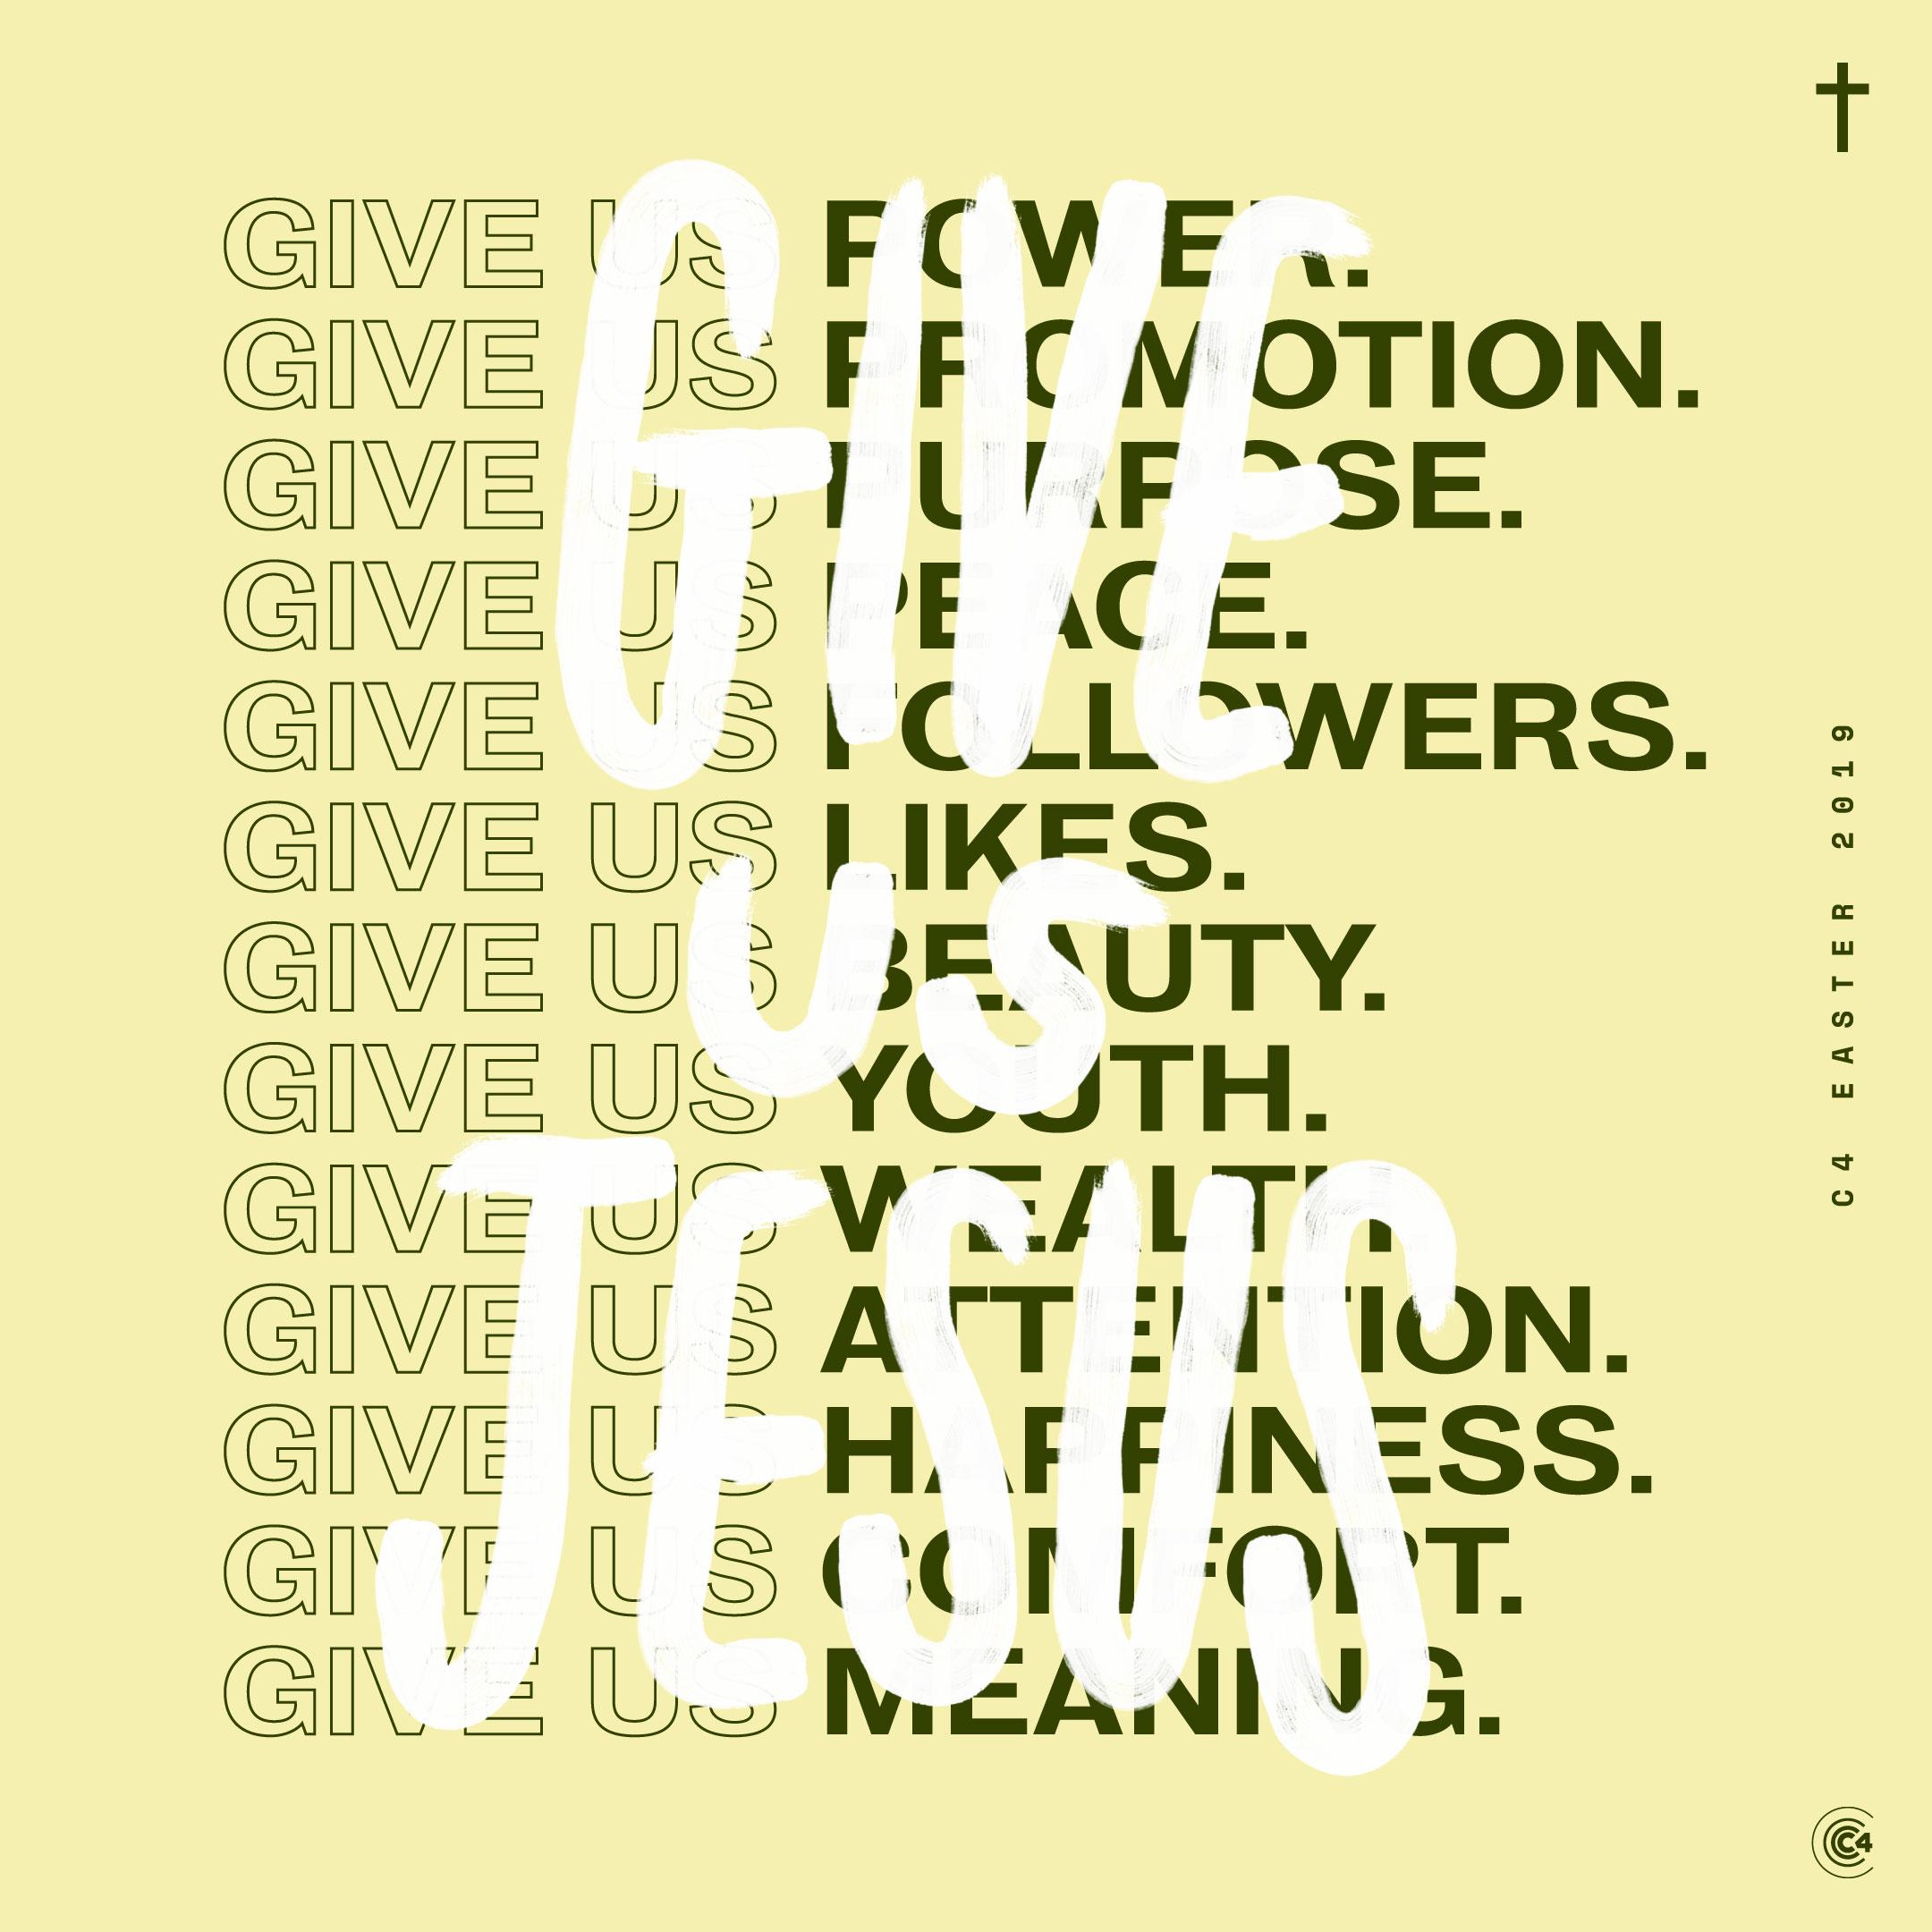 C4-Easter-Give-Us-Jesus-2.jpg